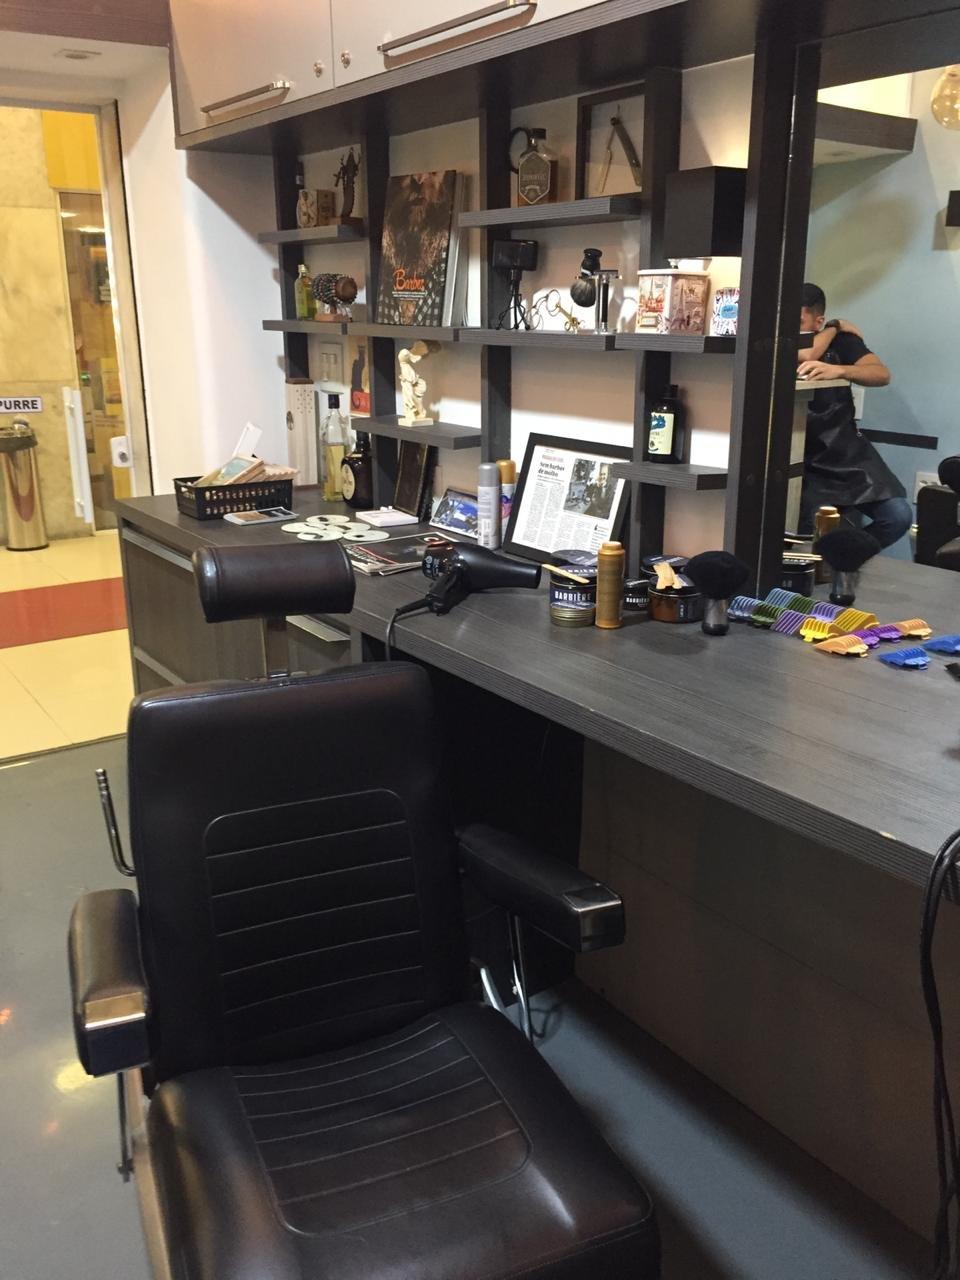 Salon de coiffure et barbier en plein coeur d'Ipanema